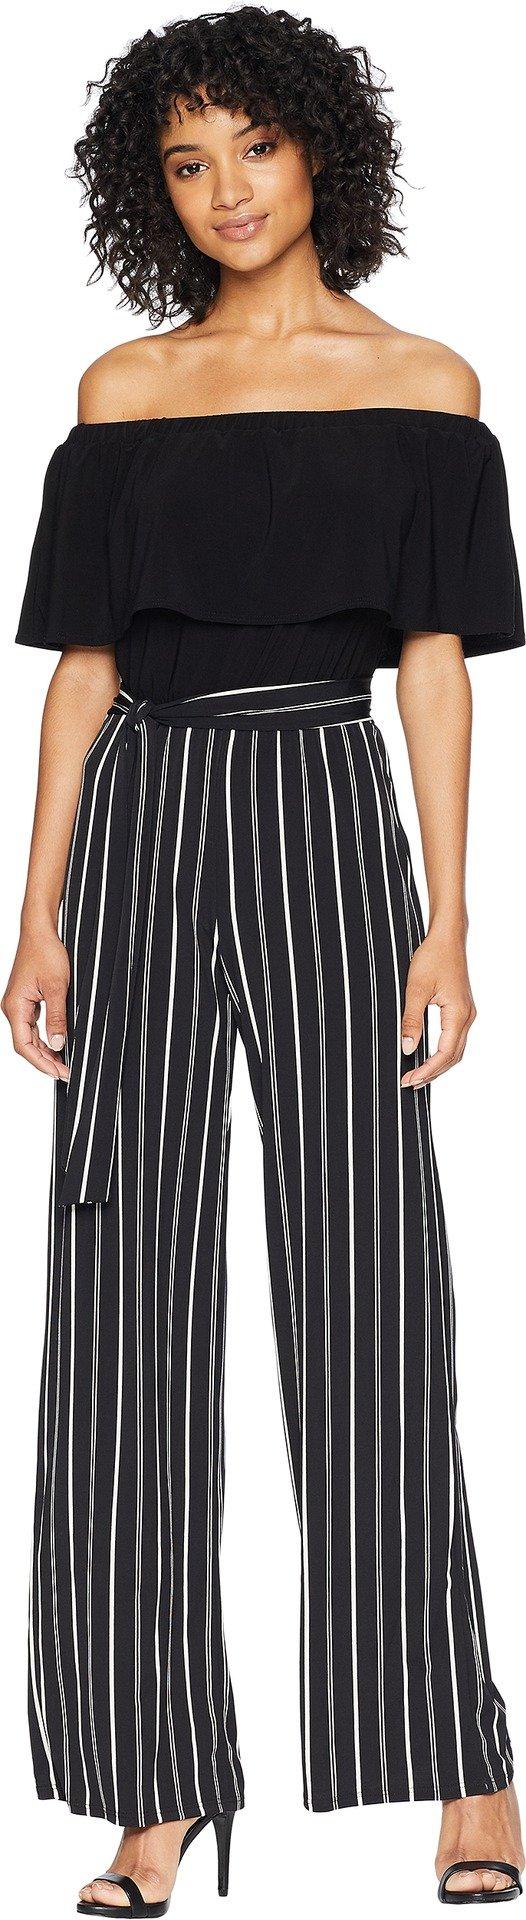 bebe Women's Off The Shoulder Pin Stripe Jumpsuit, Black, 10